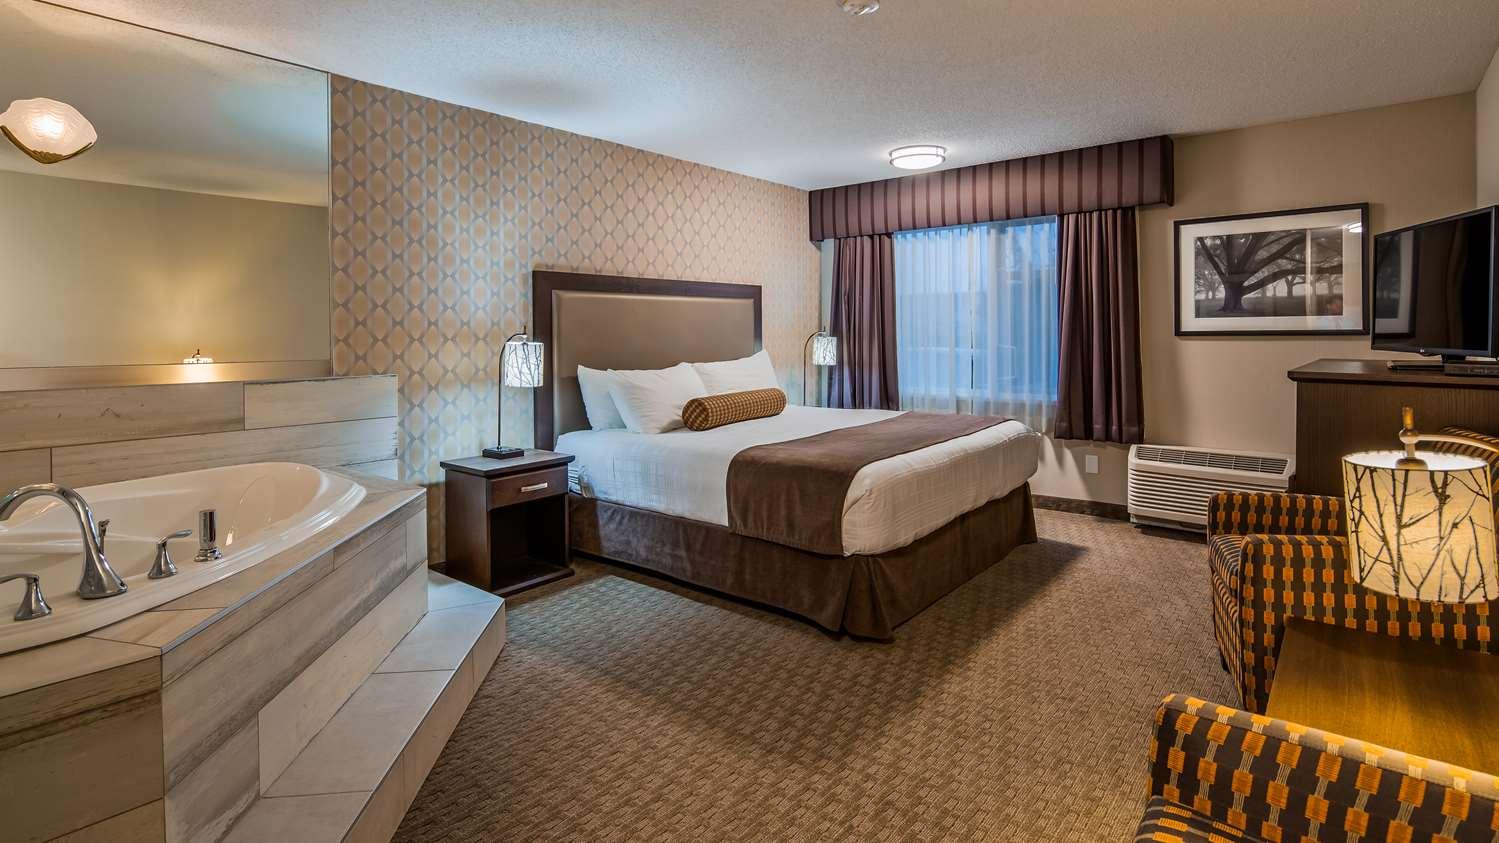 Best Western Hotel - Bedroom